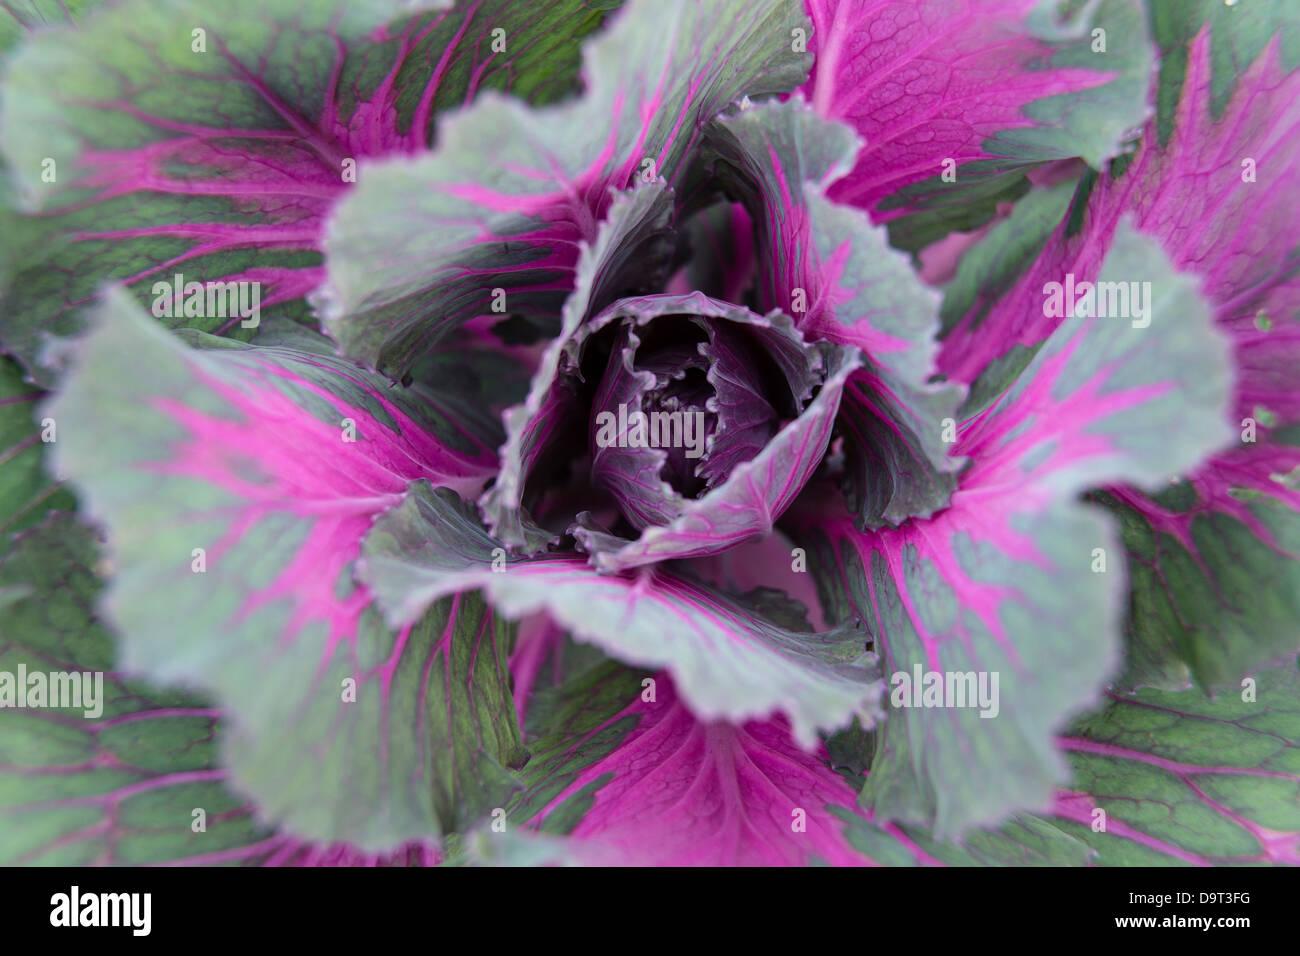 abstract detail of a cabbage, Kandawgyi Gardens, Pyin Oo Lwin, Myanmar (Burma) - Stock Image